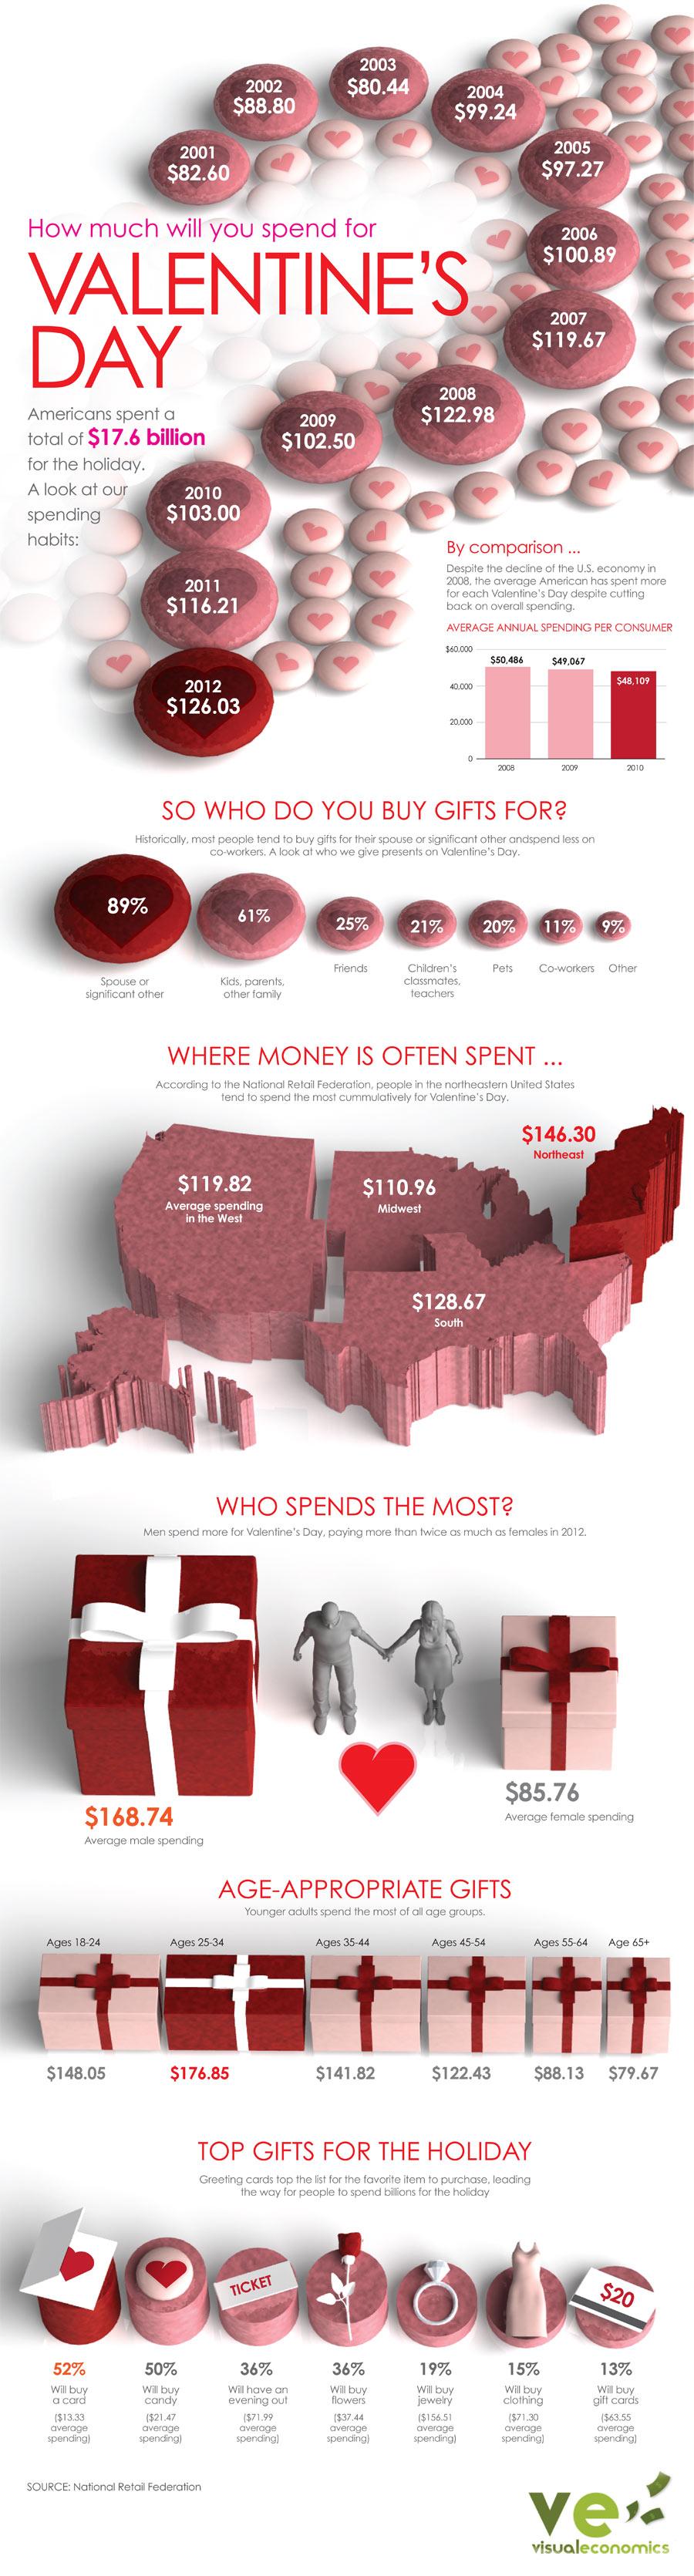 Valentines Day spending infographic